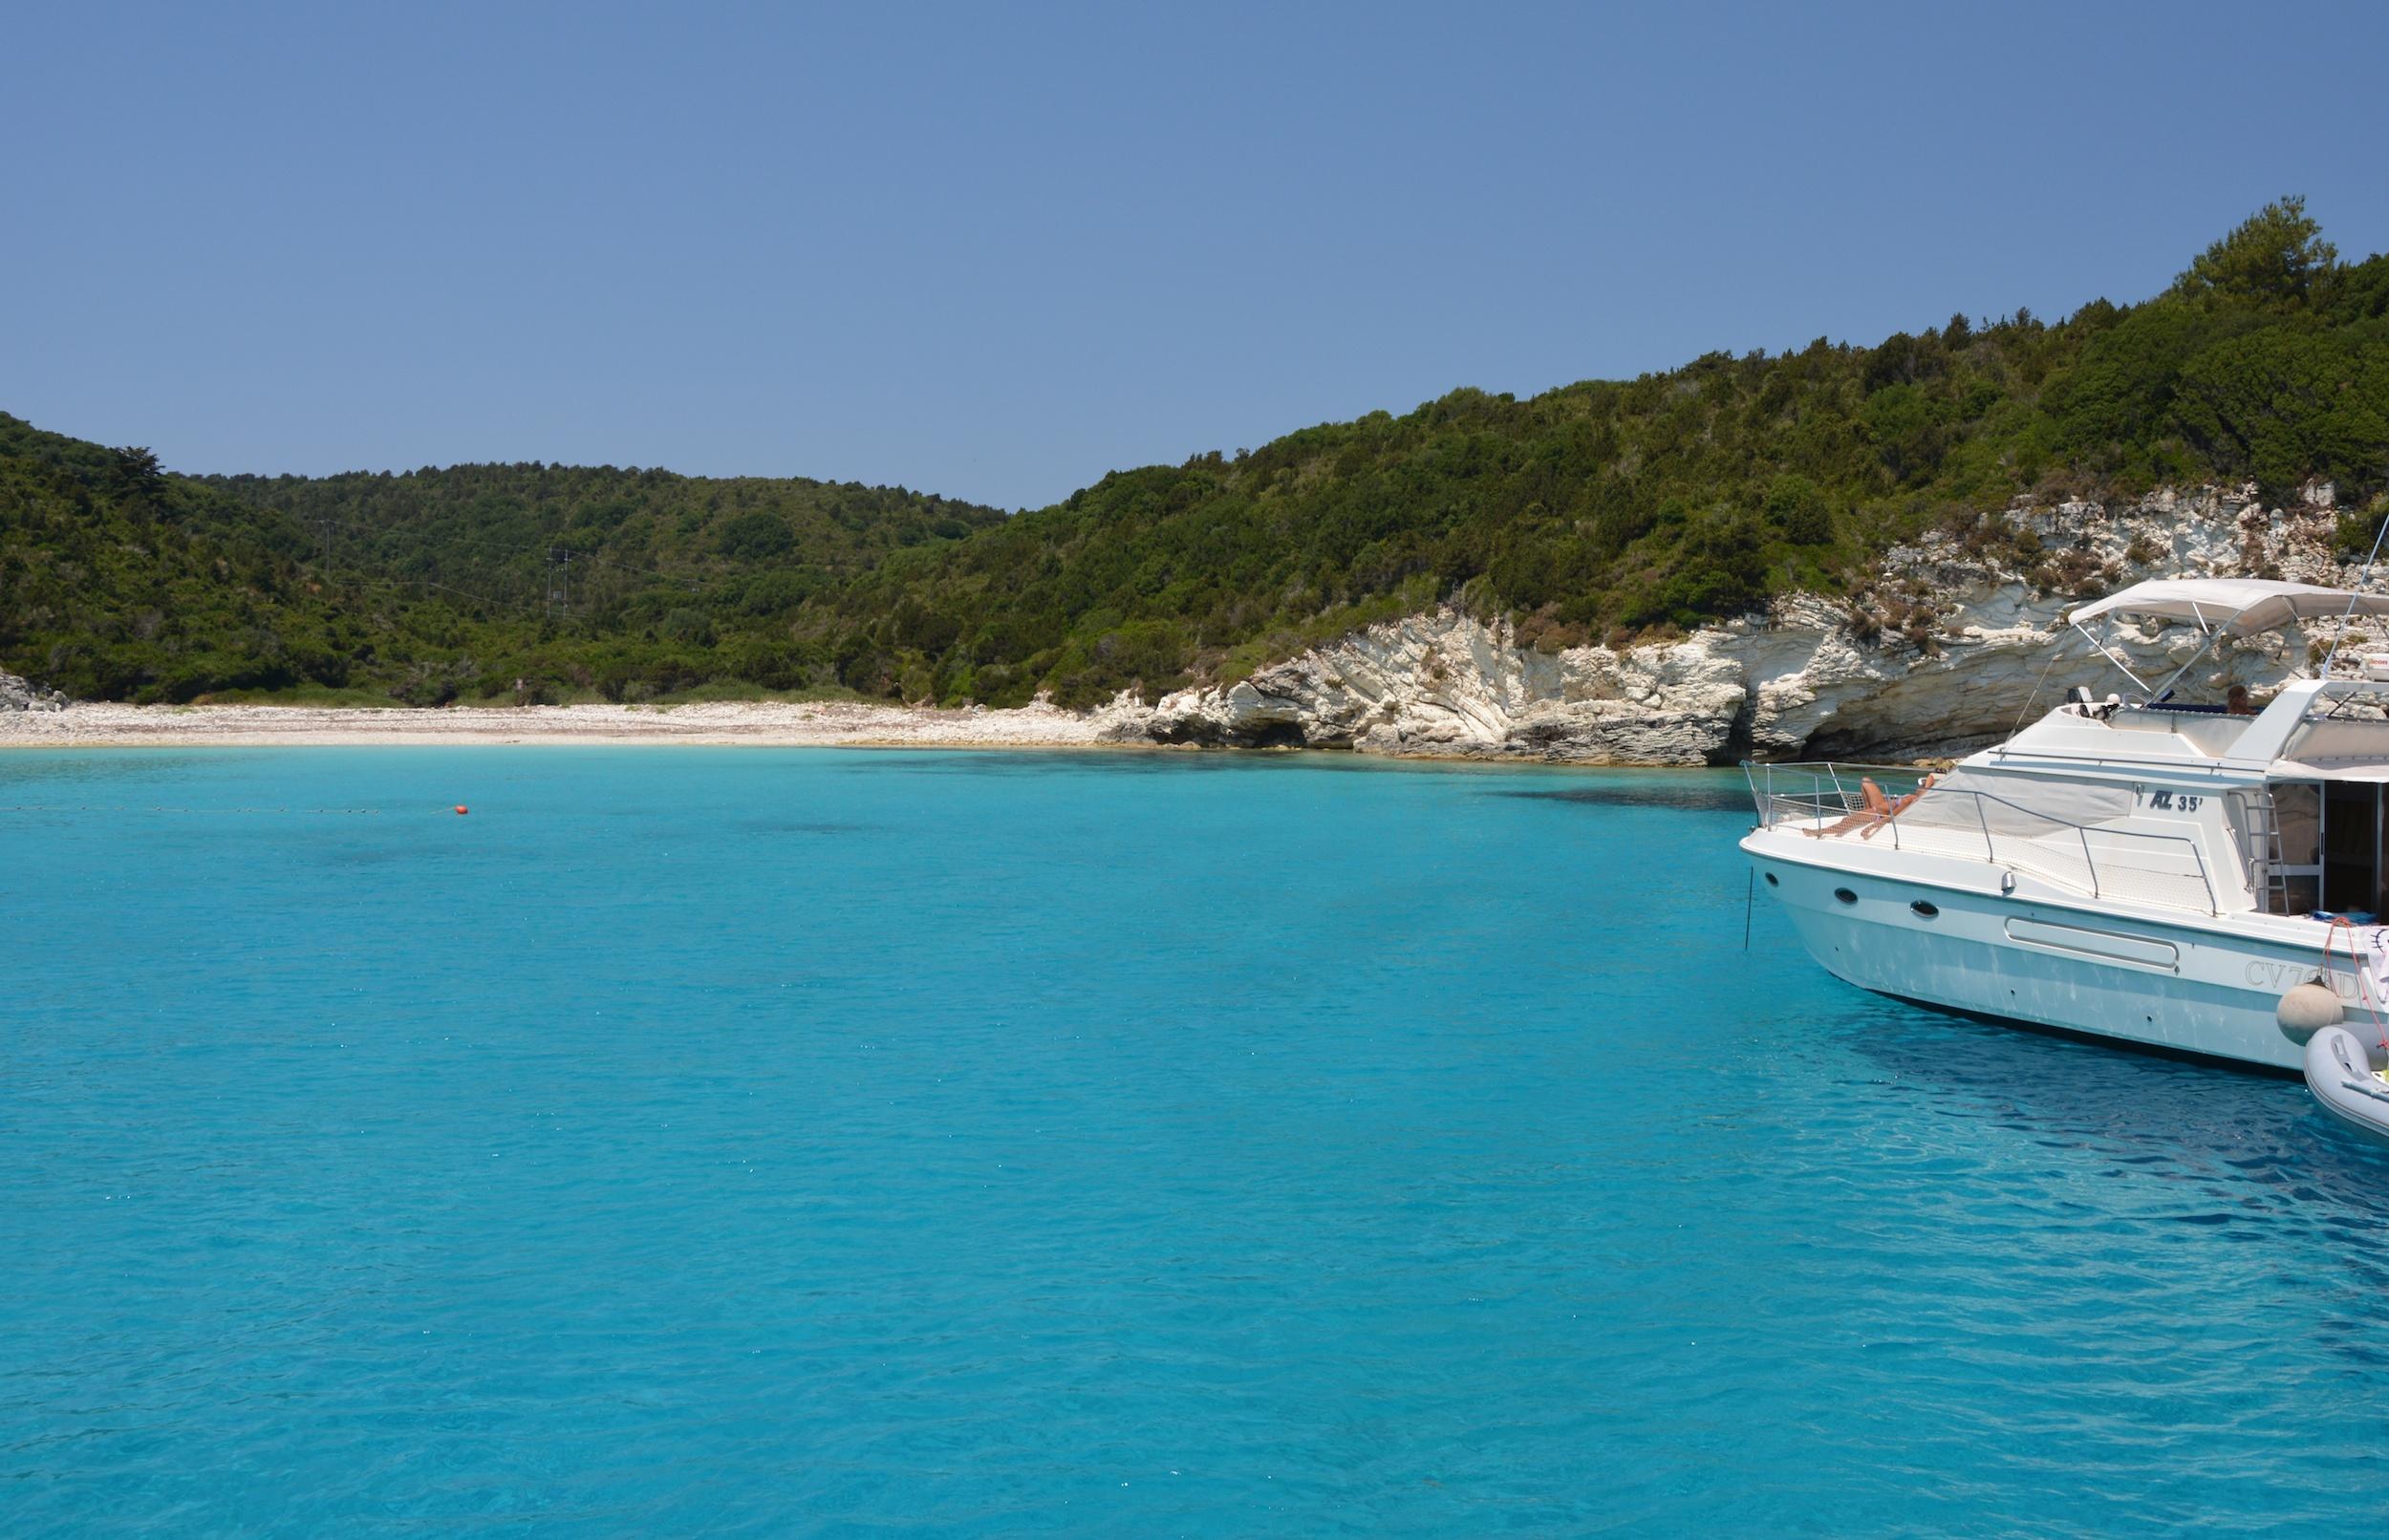 Island Antipaxos